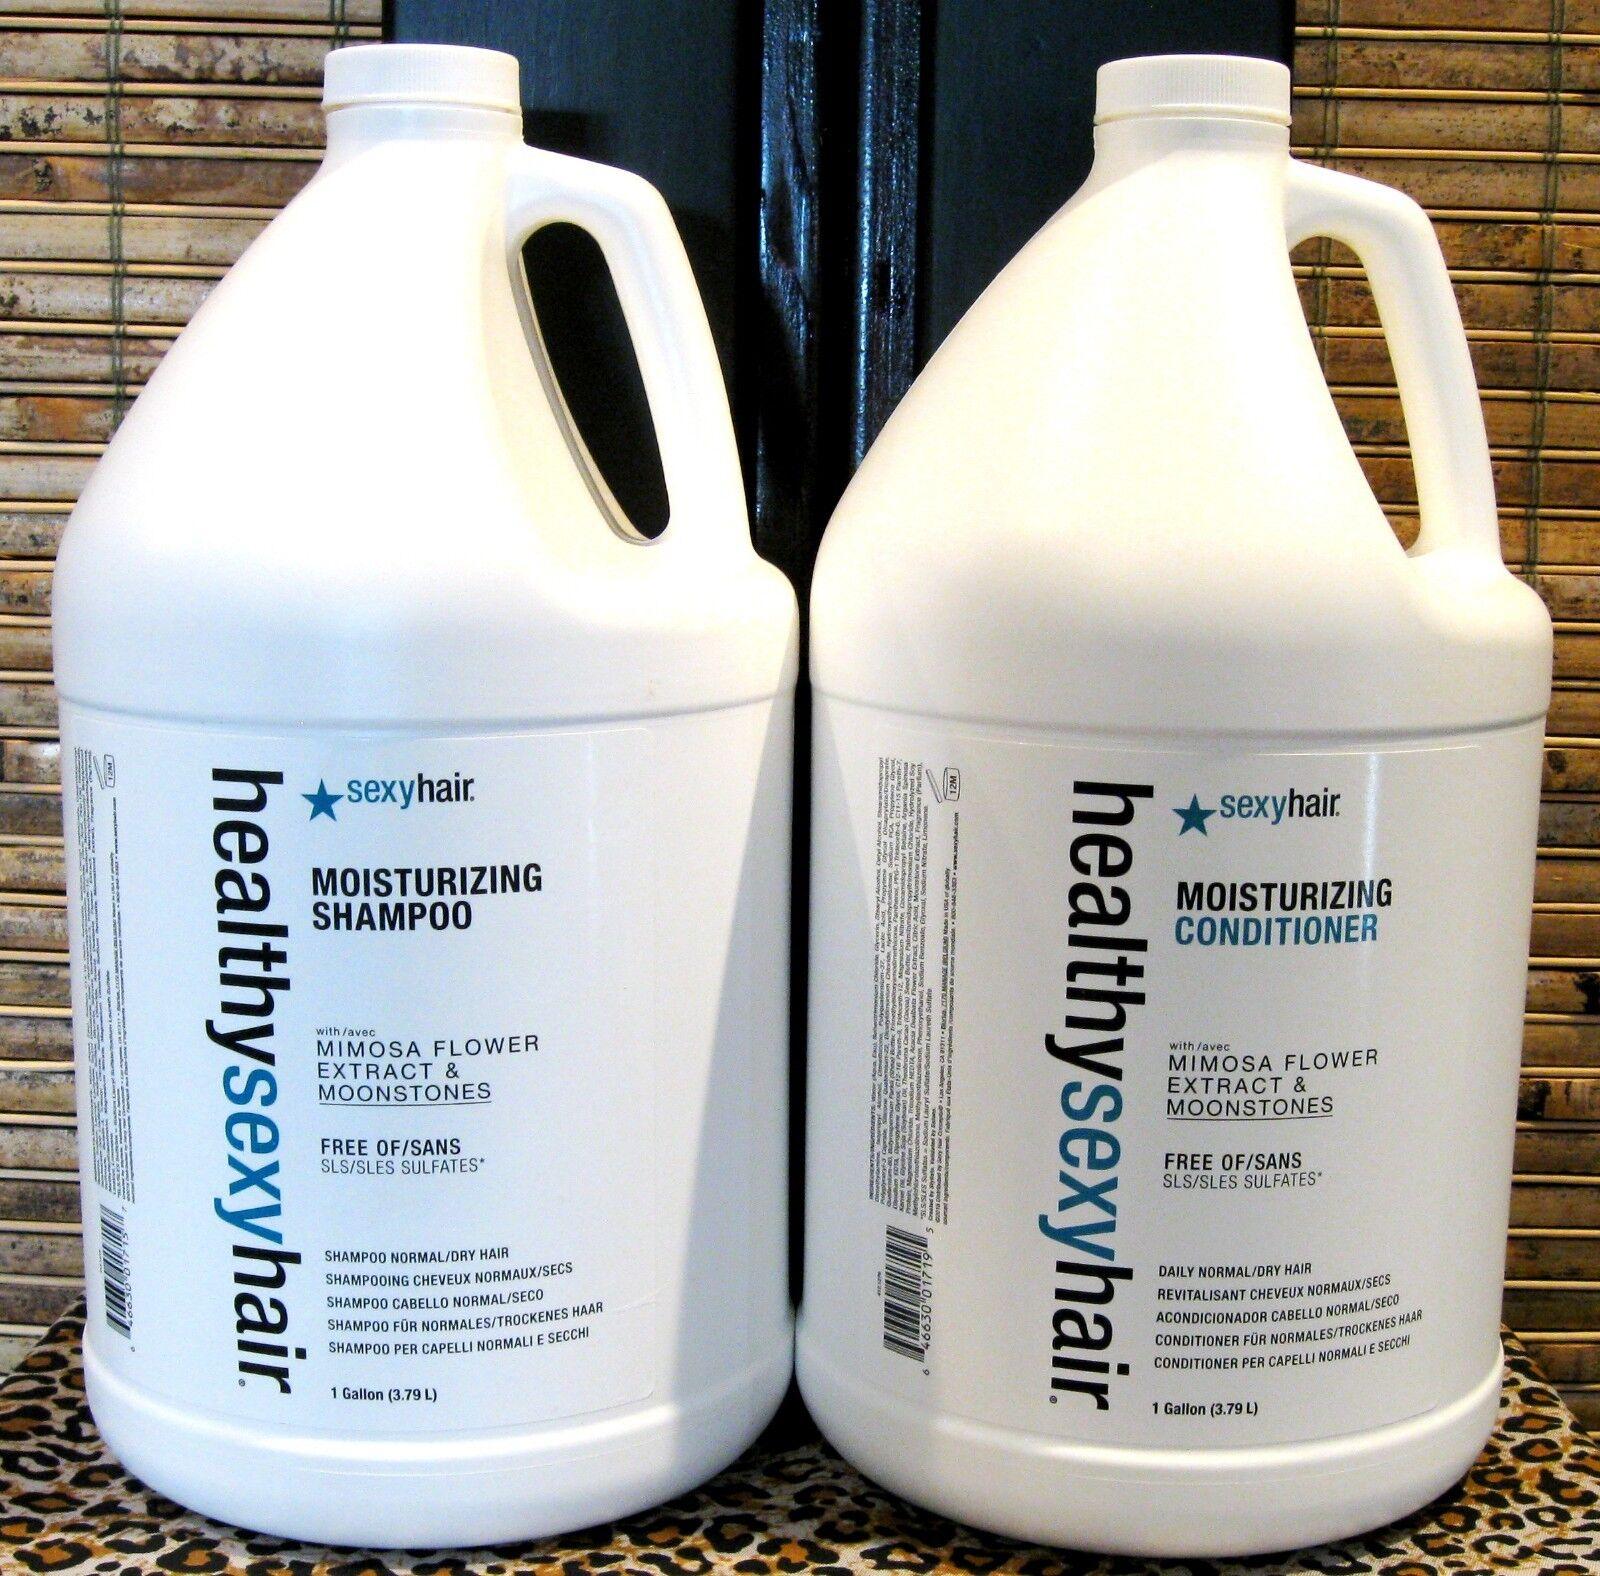 Healthy Sexy Hair Moisturizing Shampoo & Conditioner Gallon Set Duo 128 oz